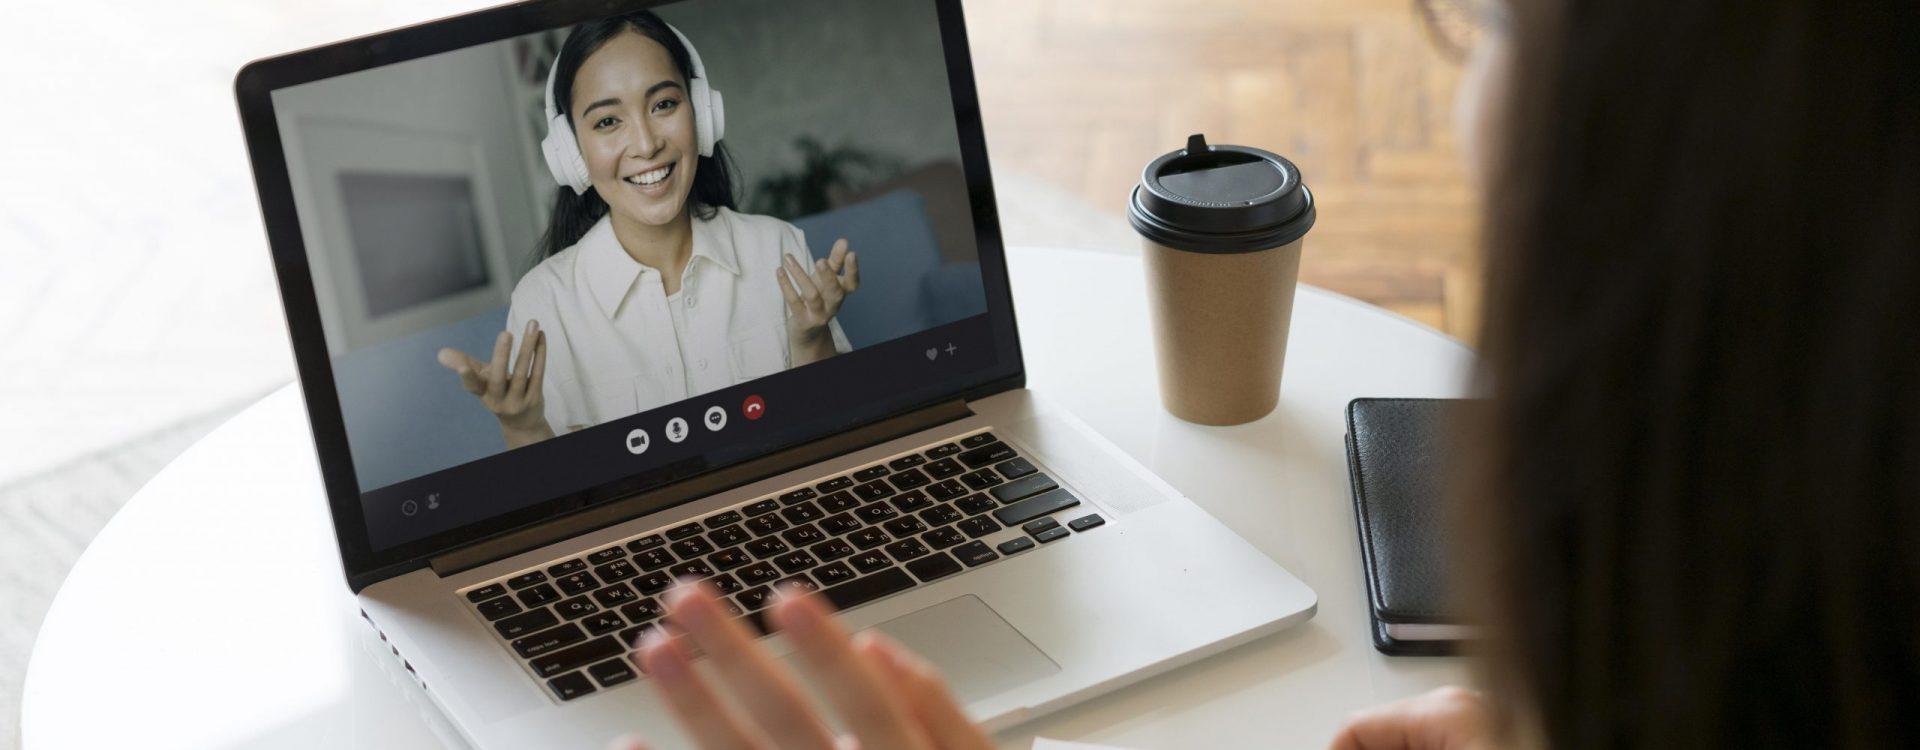 woman-having-business-meeting-online